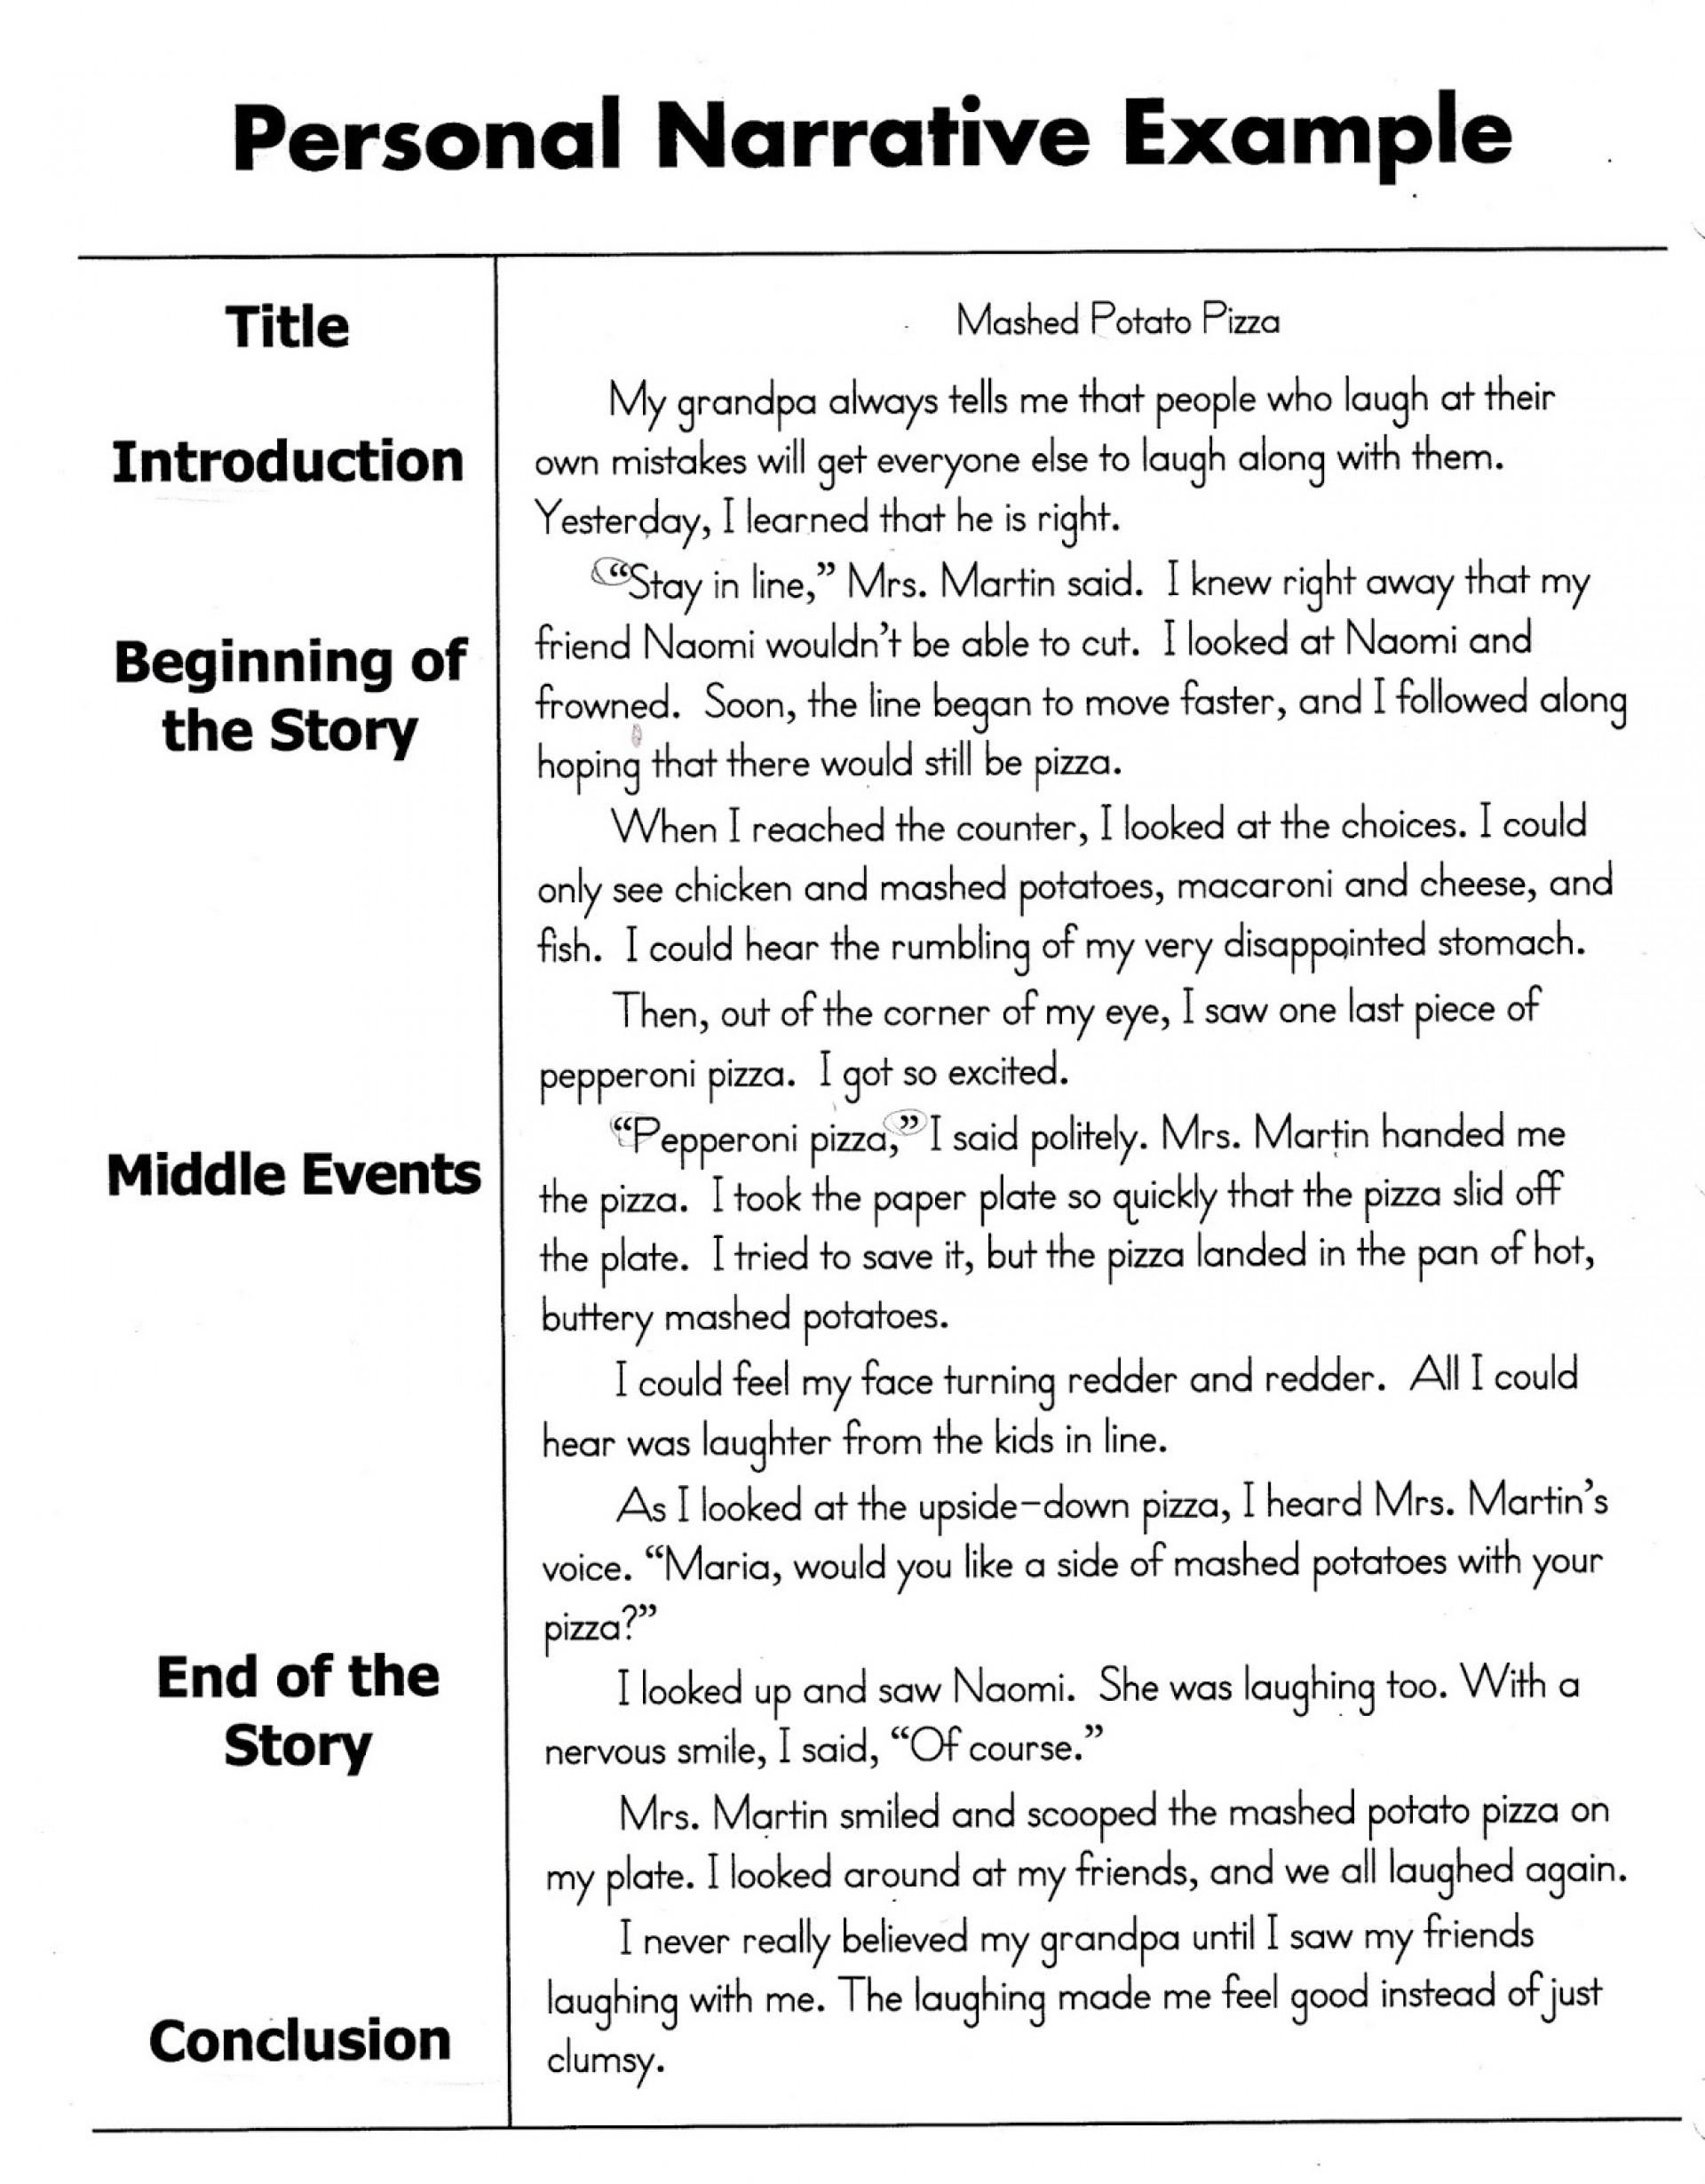 013 Essay Example Personal20narrative Narrative Unforgettable Samples Examples High School Format Interesting Spm 1920